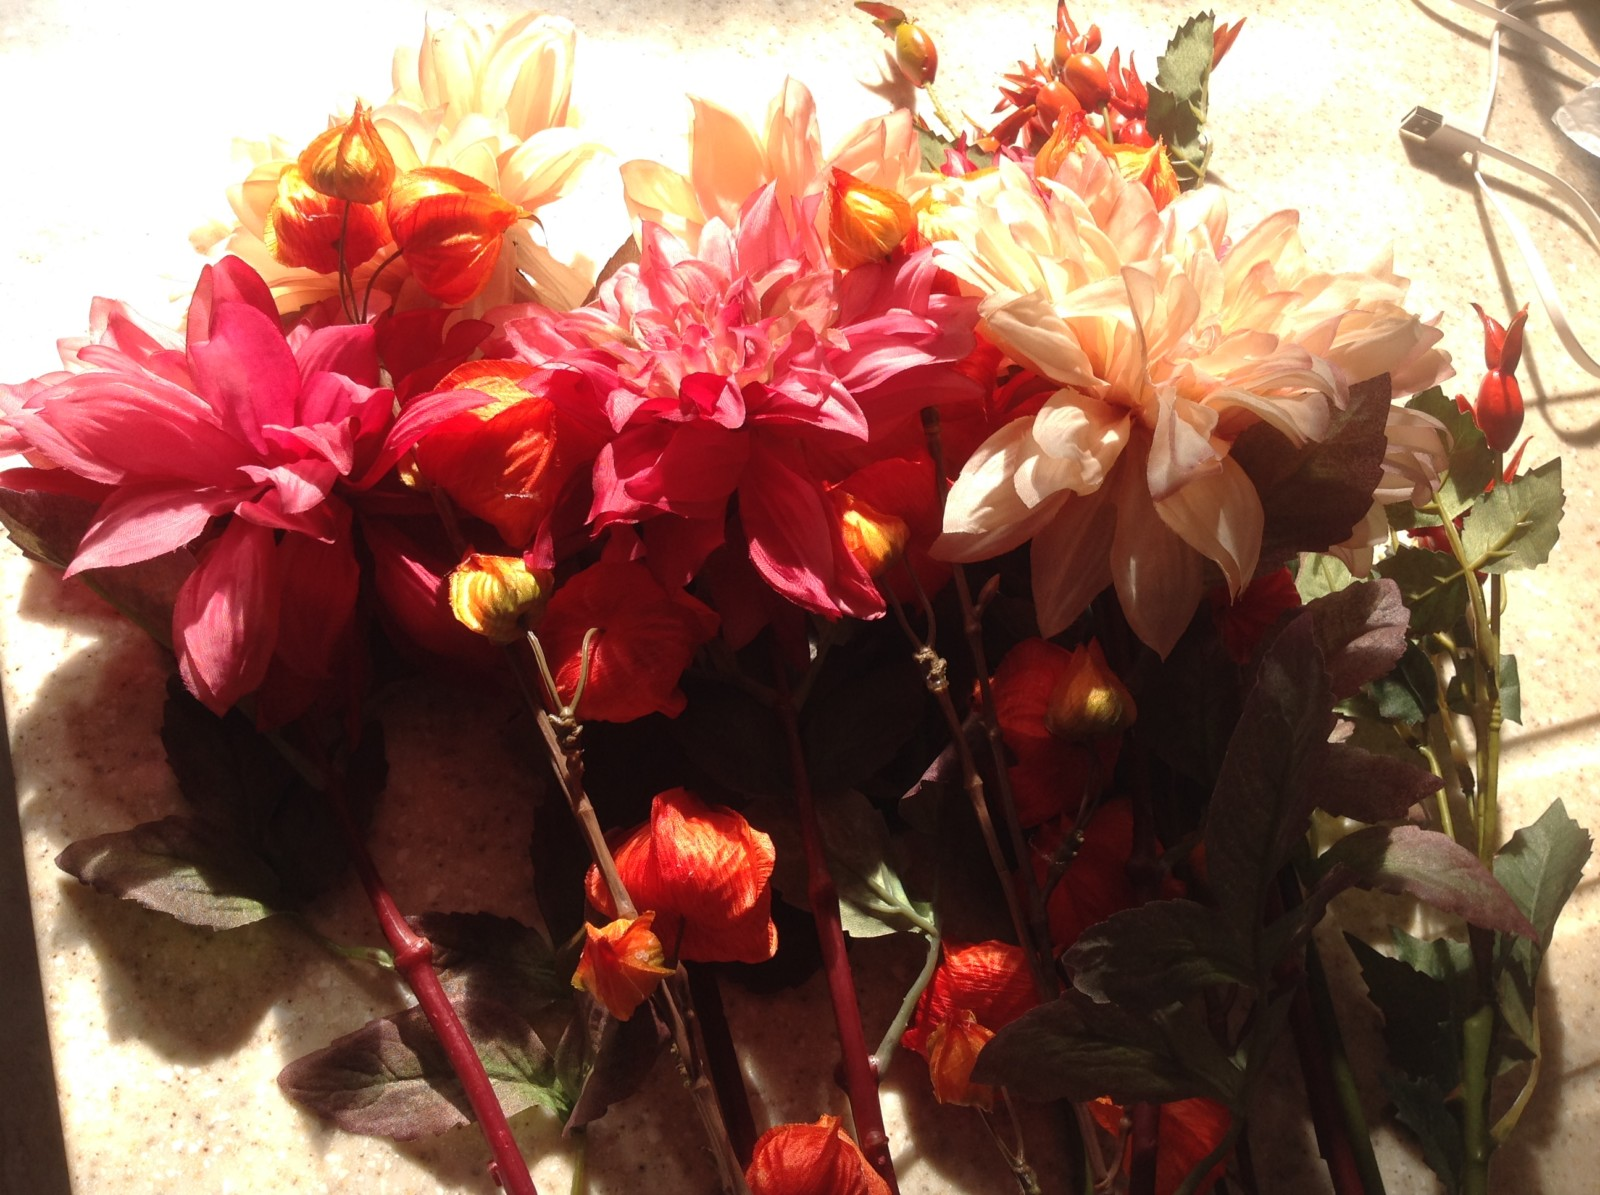 Silk flowers from Bloom